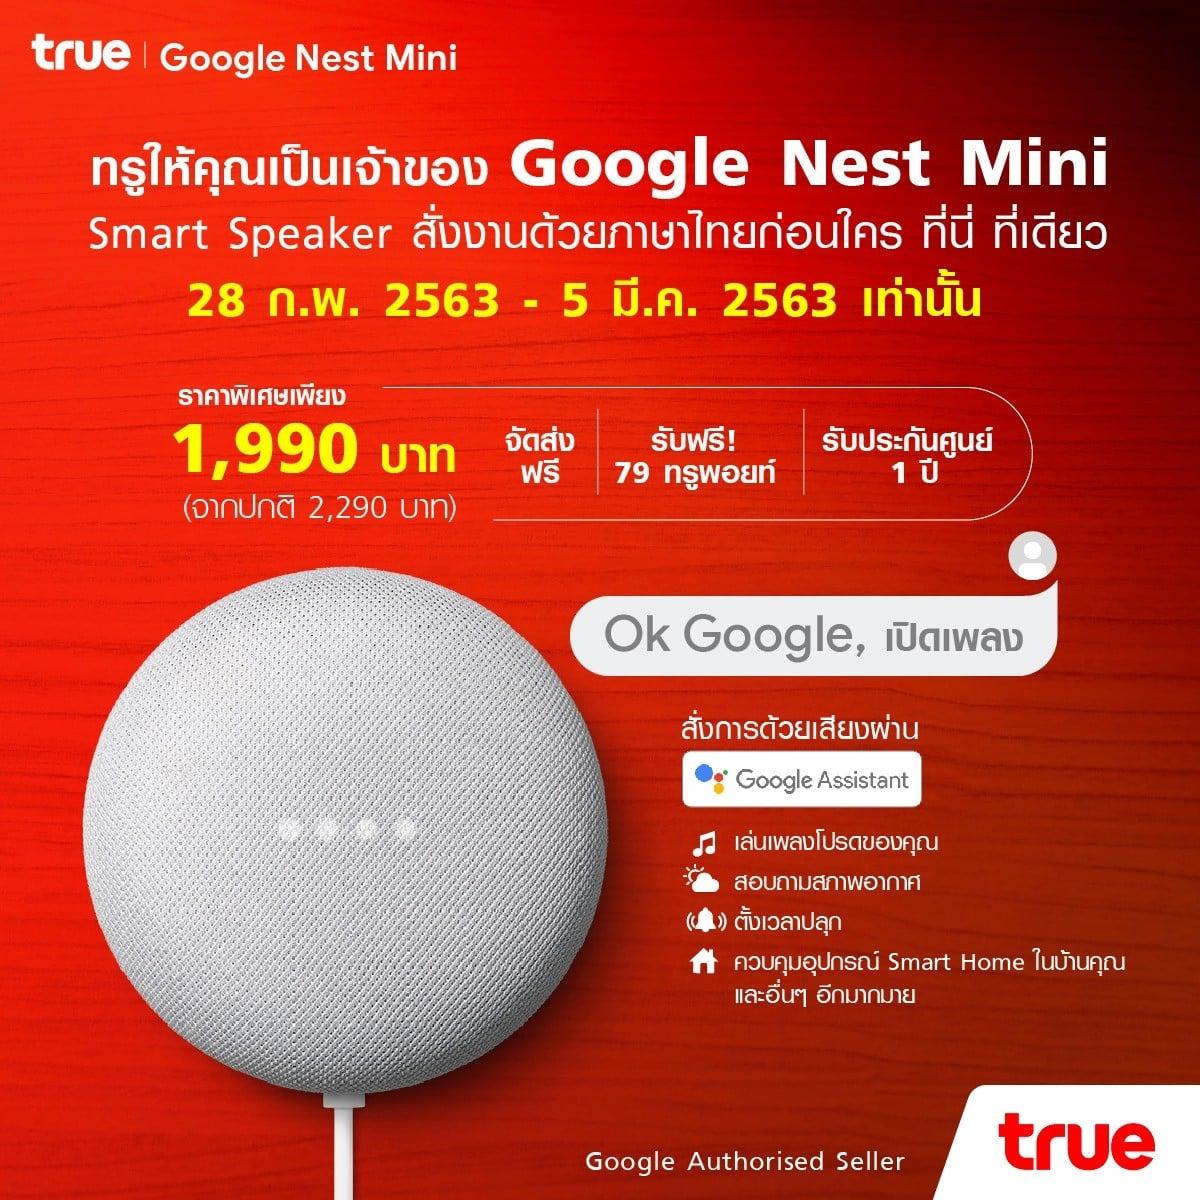 Google Nest Mini - มาแล้ว Google Nest Mini ลำโพงอัจฉริยะเวอร์ชั่นภาษ าไทย เฉพาะที่เว็บไซต์ TrueStore เท่านั้น